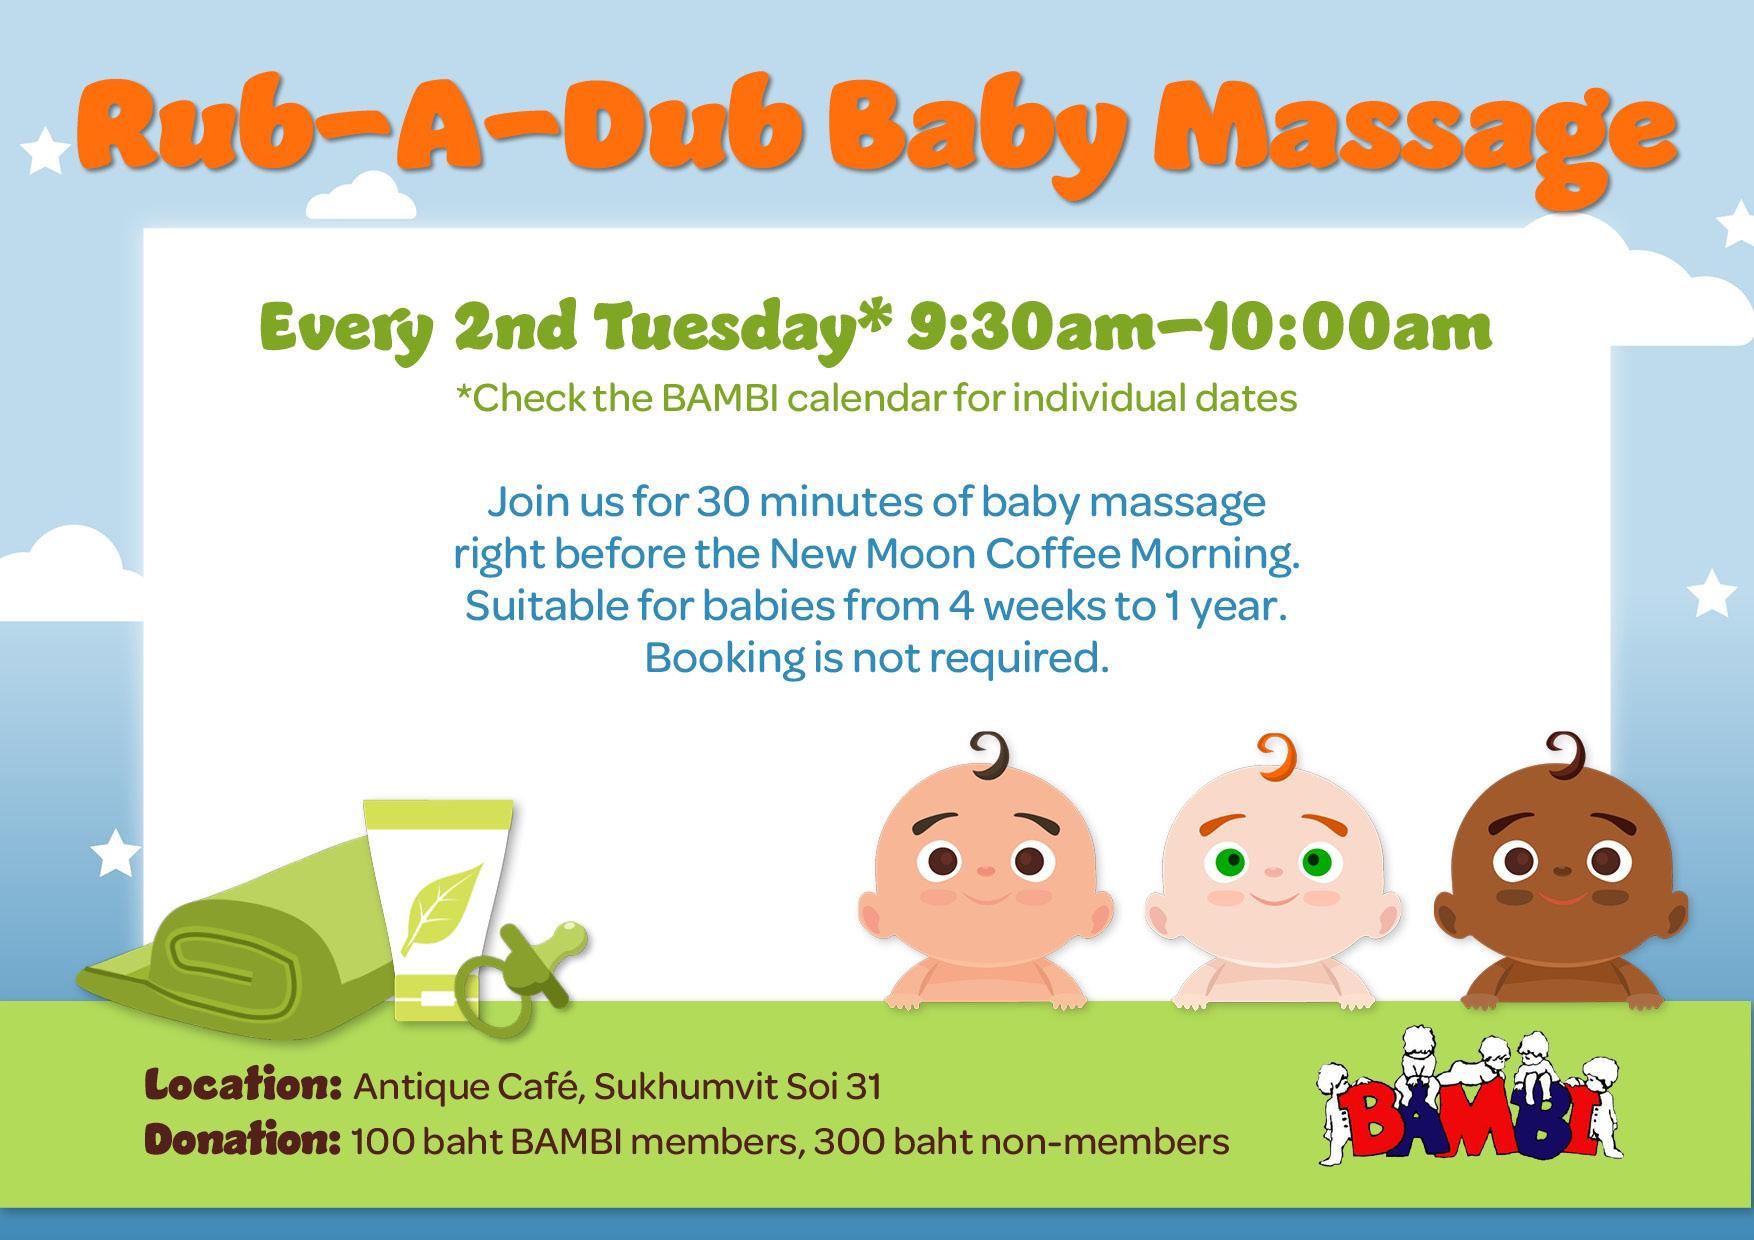 Rub-a-Dub Baby Massage